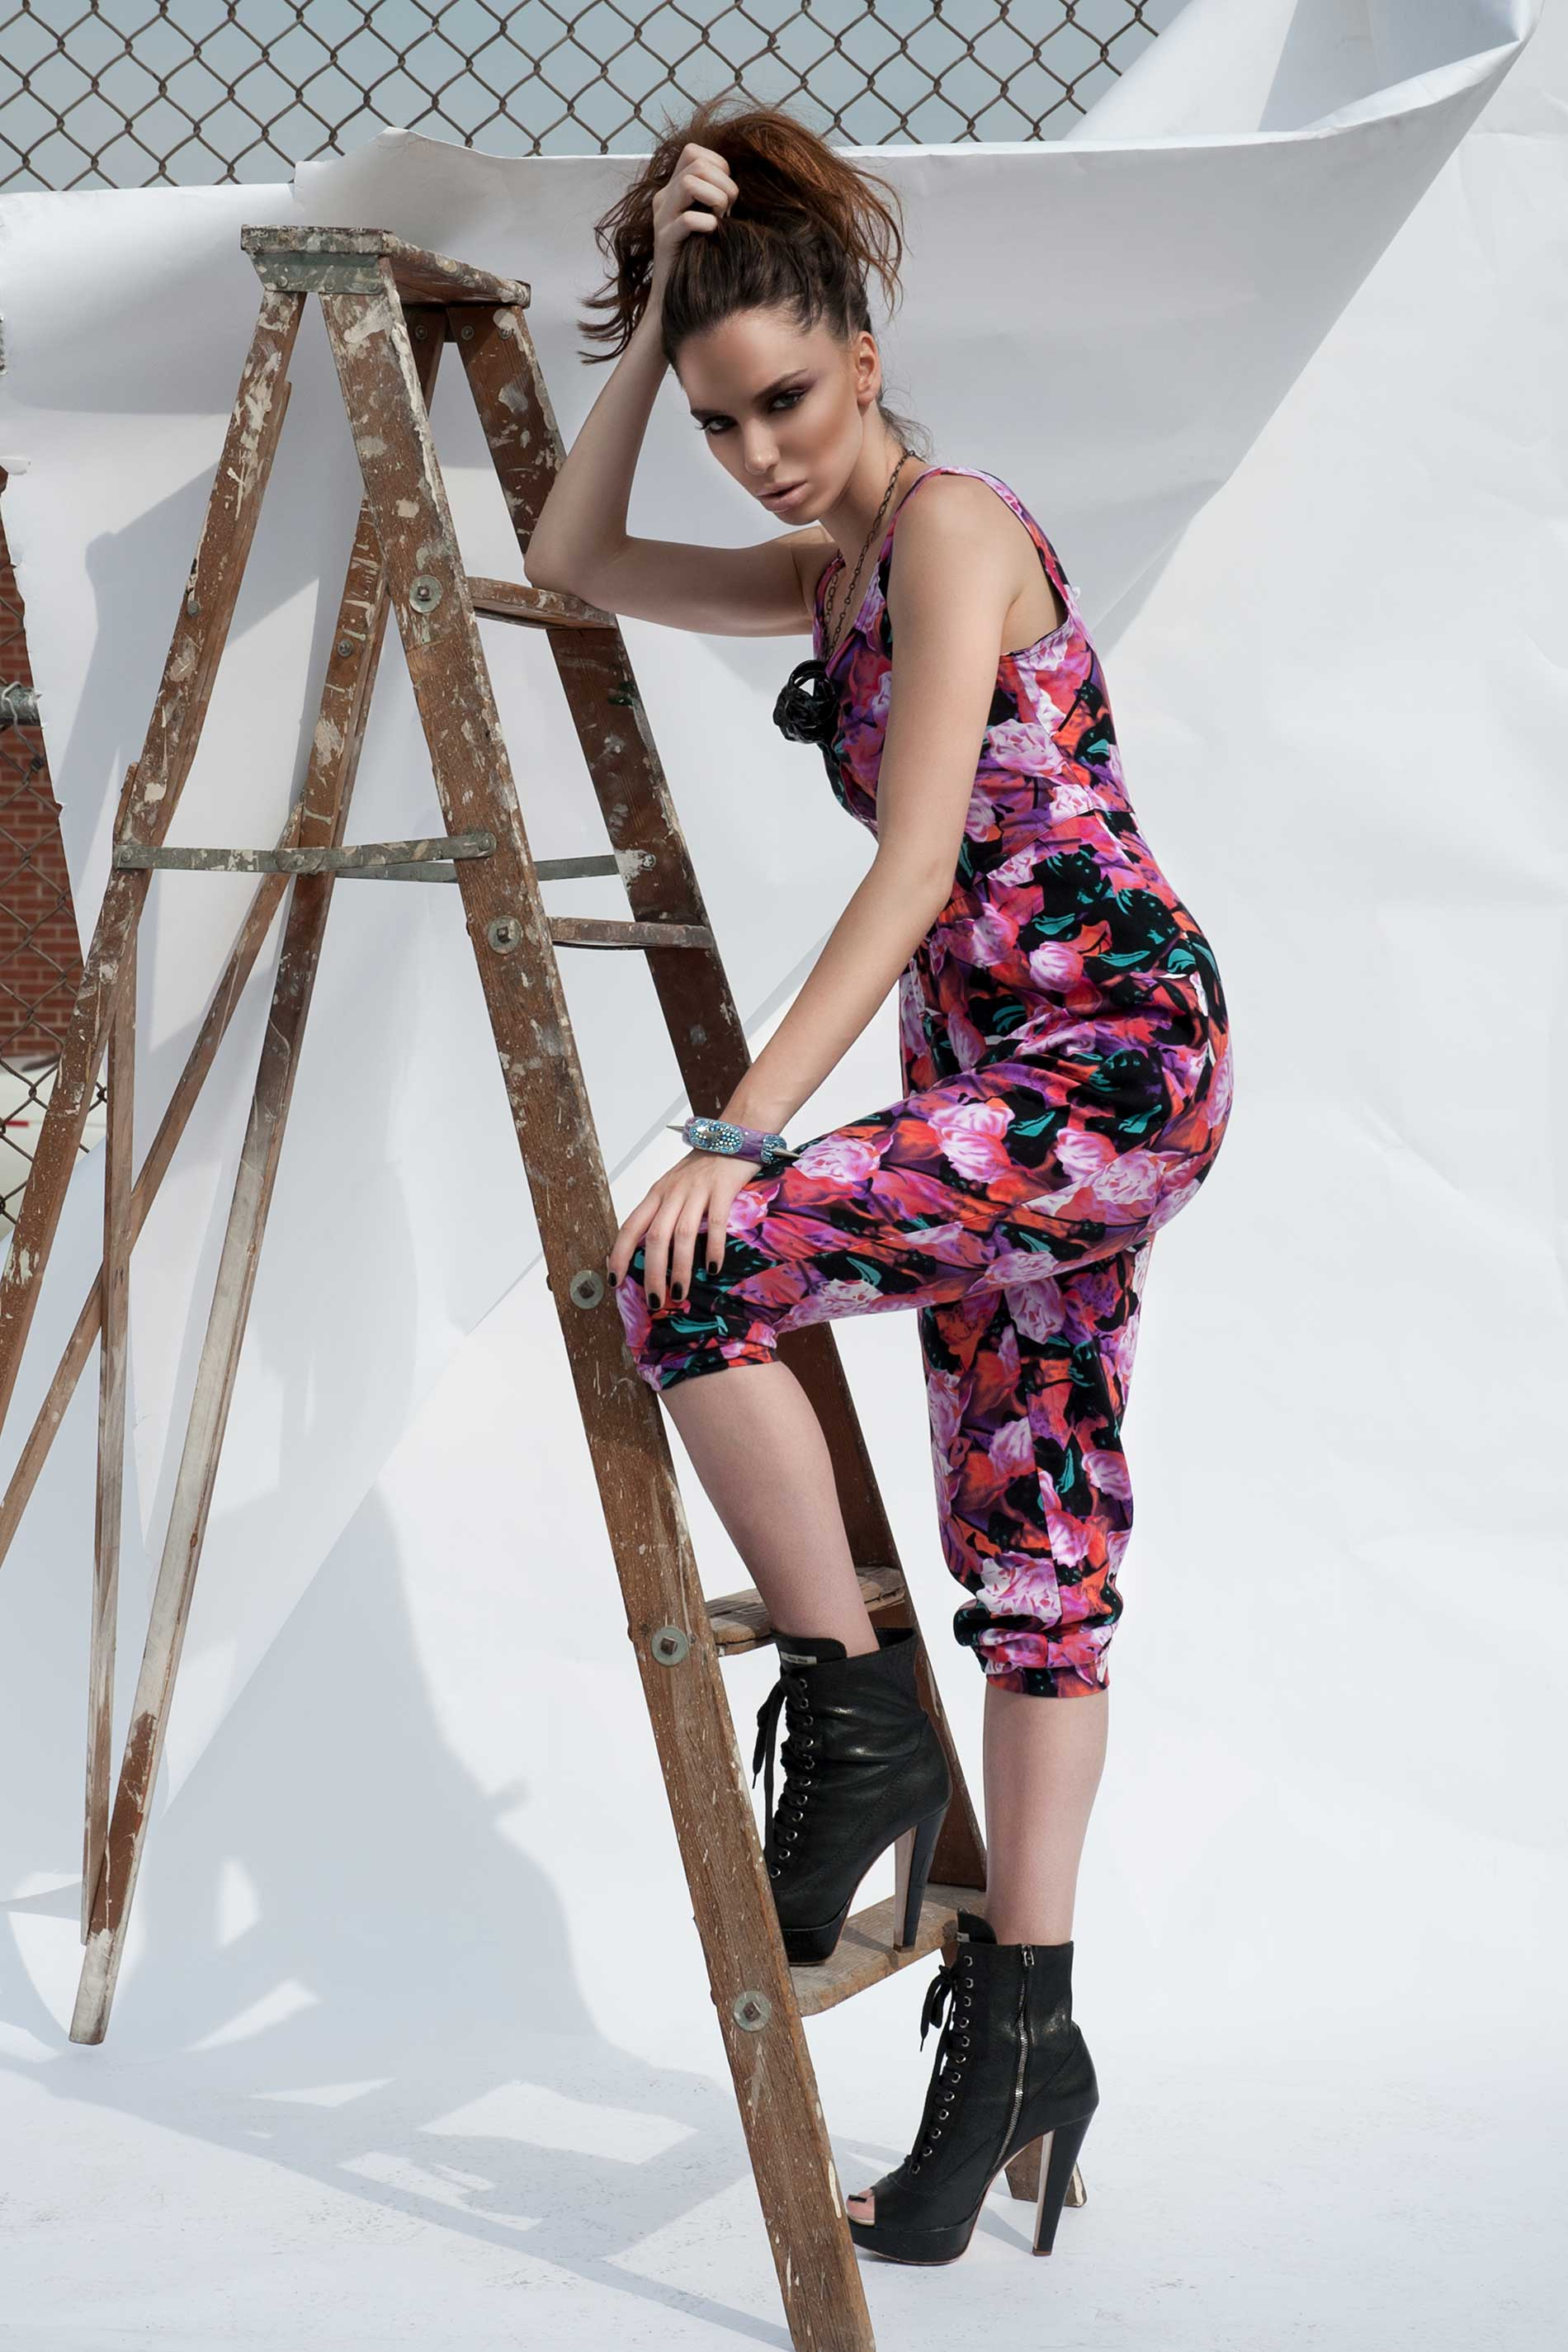 alicia-oliveri-professional-make-up-artist-new-york-city-chew-magazine-4.jpg